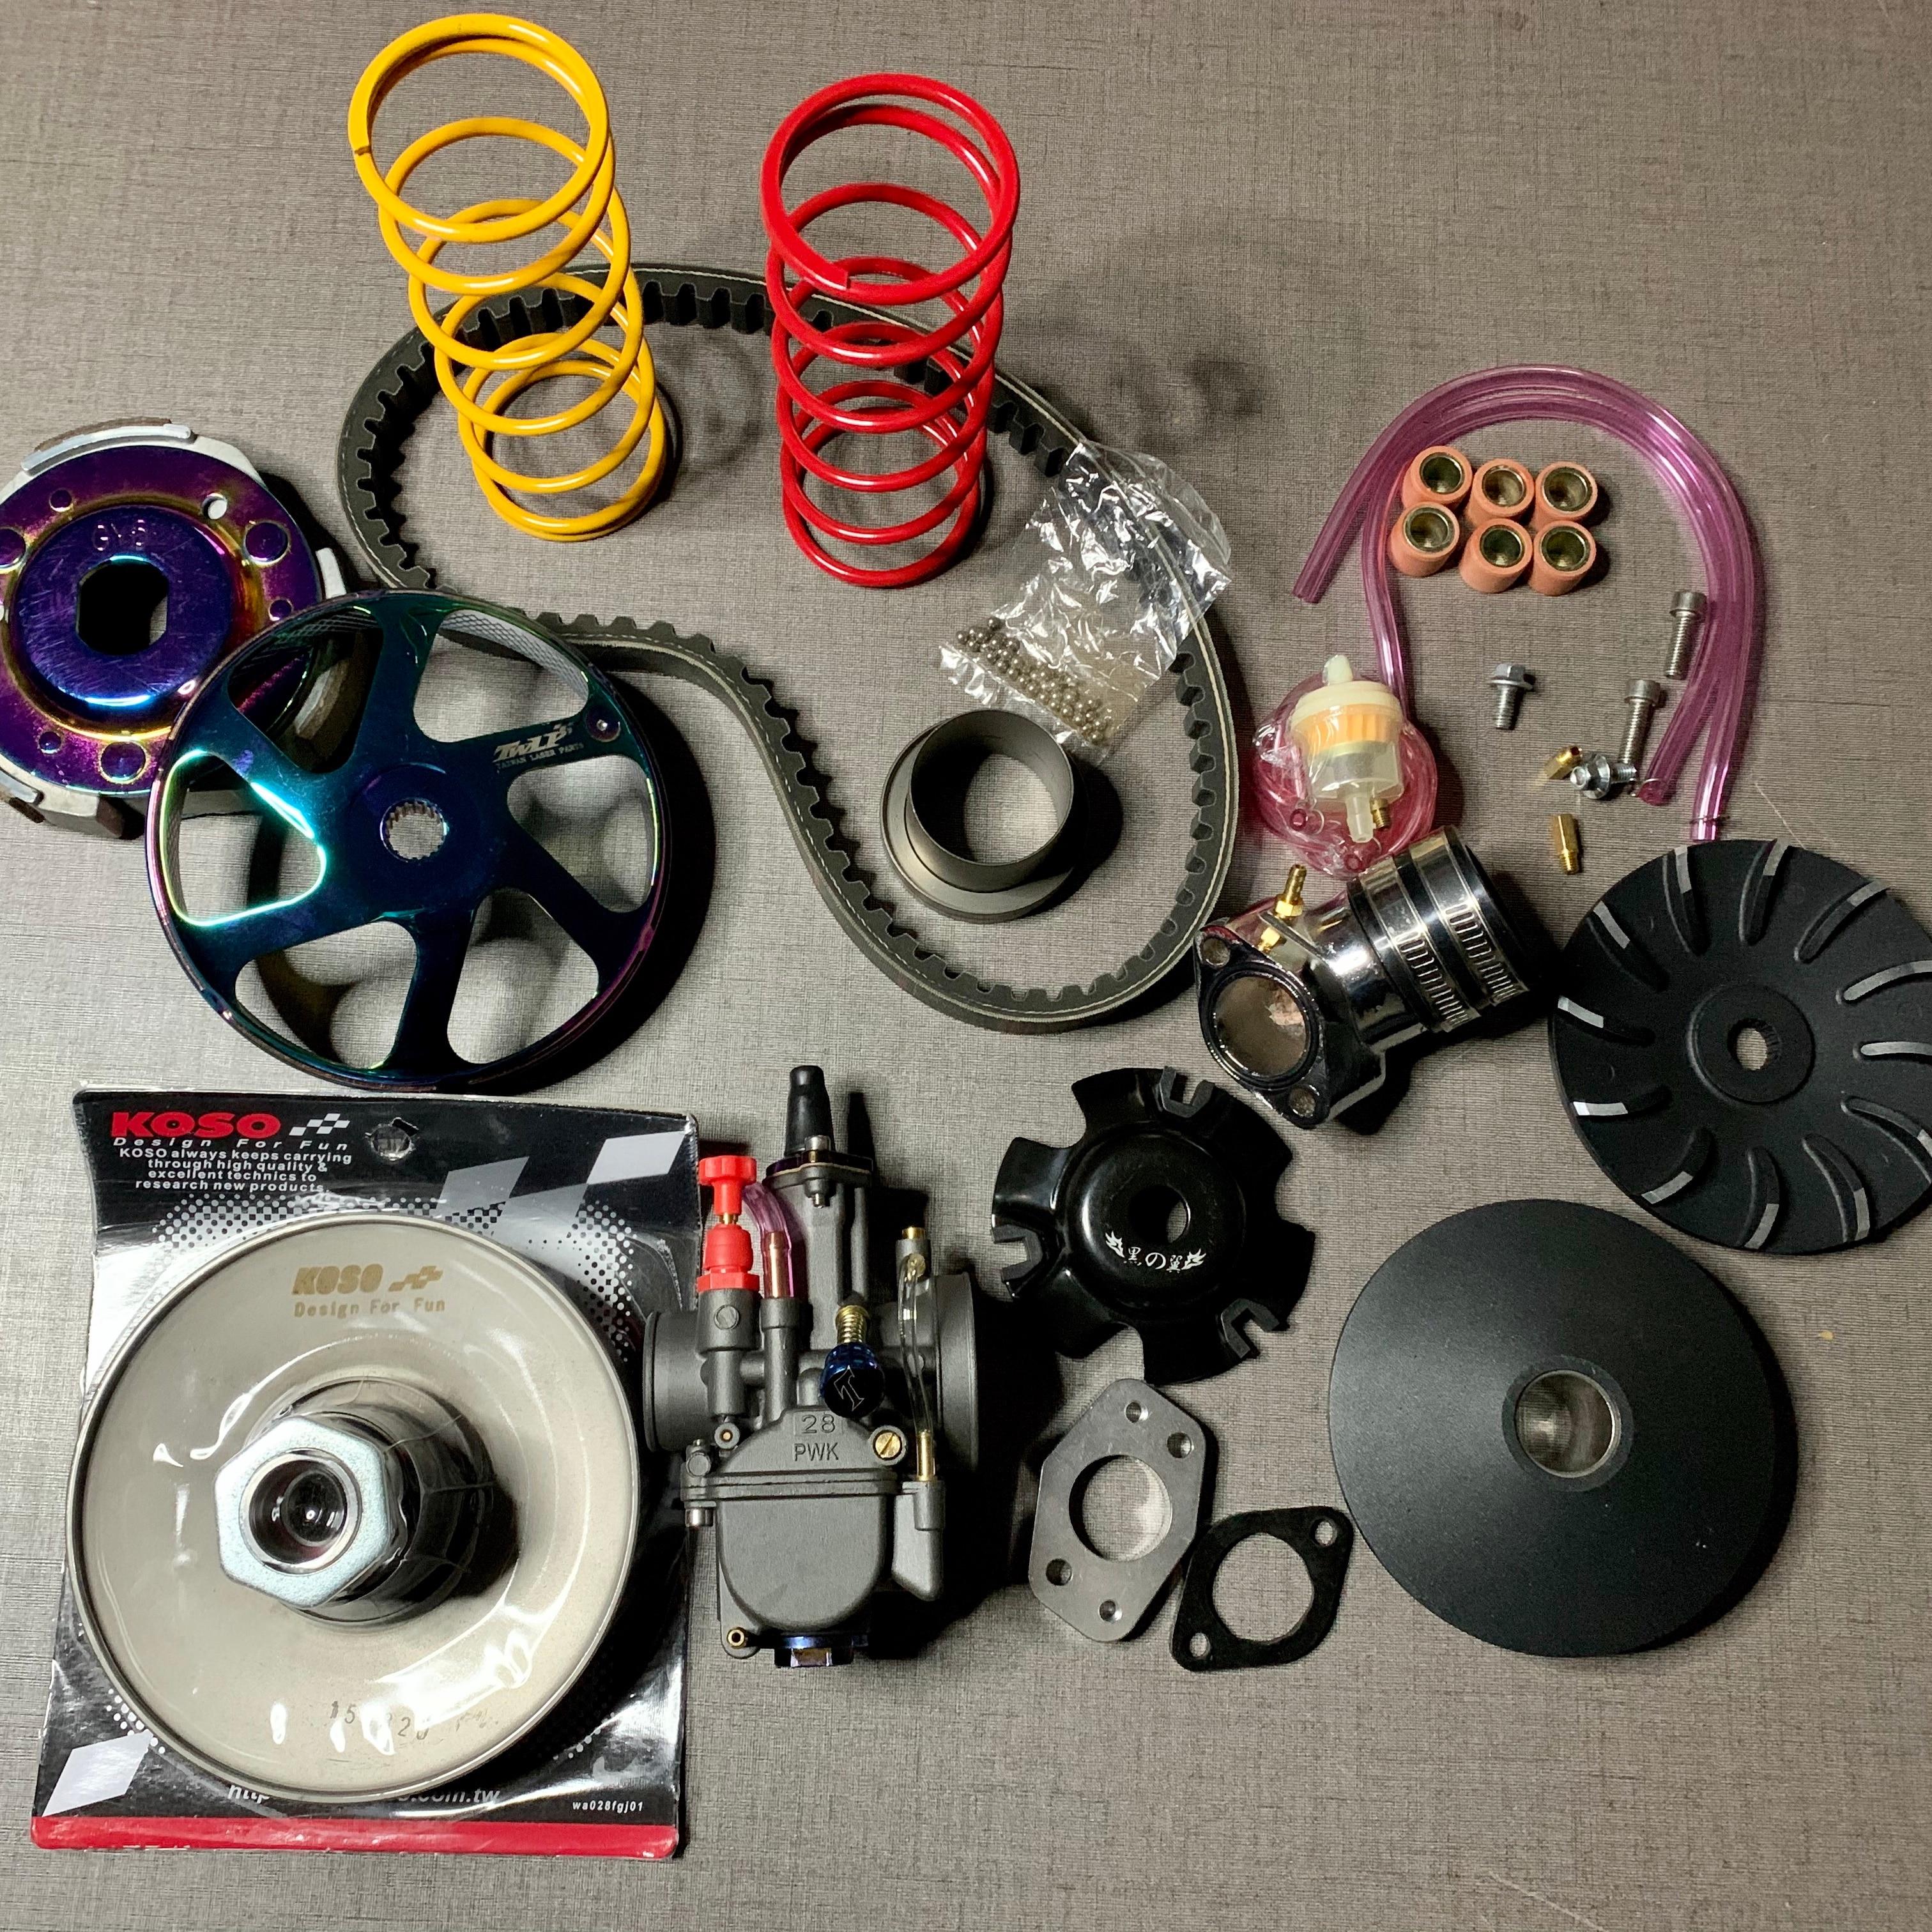 GY6 Racing Clutch Transmission Kit 157QMB 157QMJ 152QMI LF150T LIBERTY CVT Set Tuning Variator Pulley Belt Carburetor GO KART